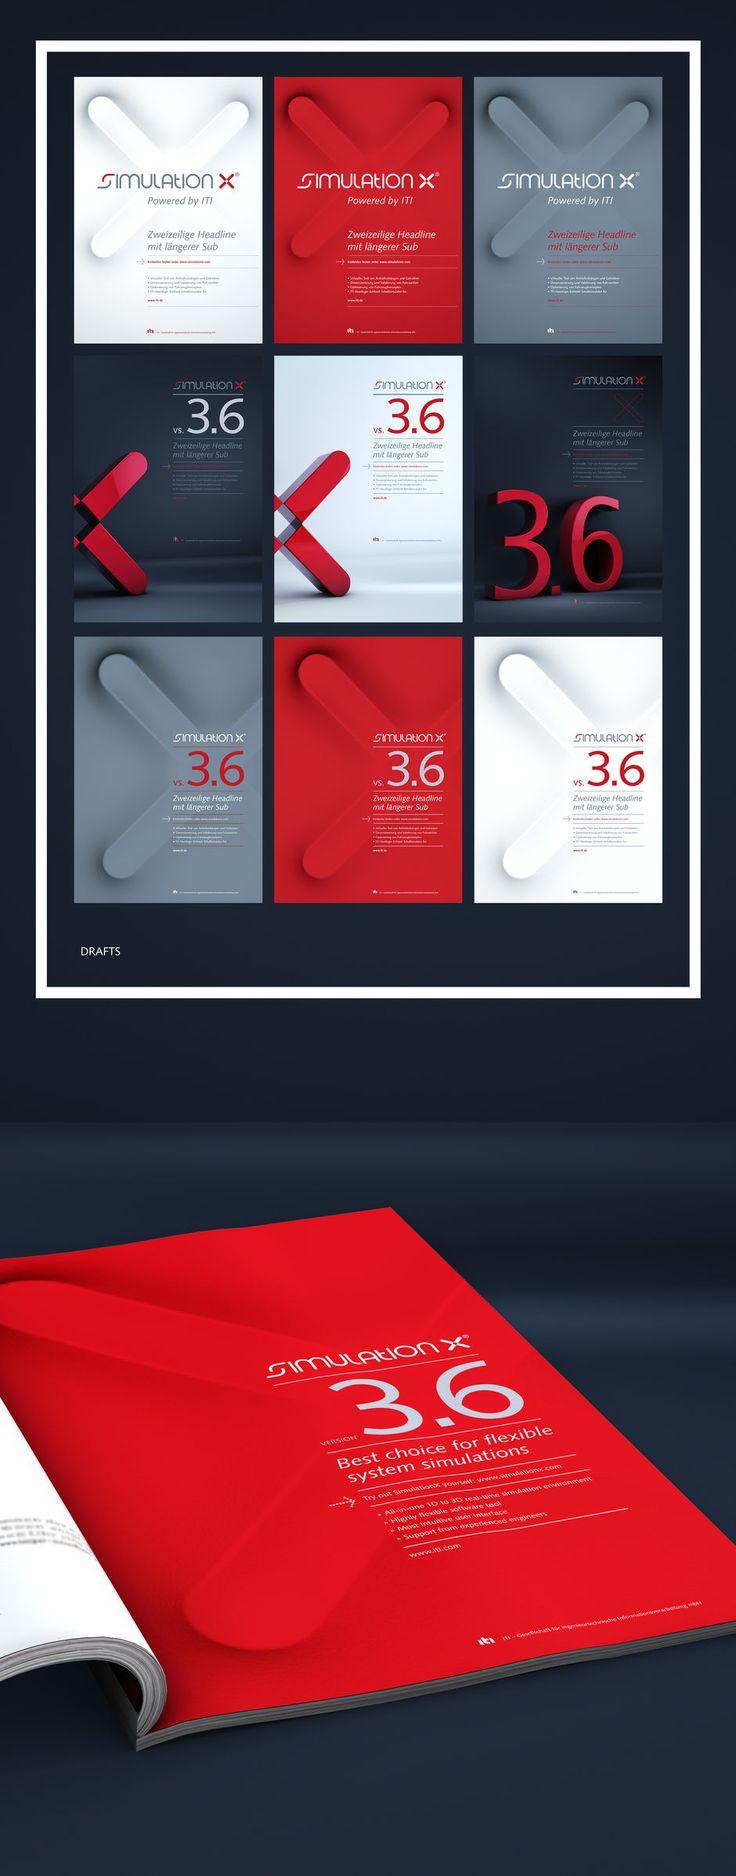 ATMO Designstudio - Keyvisual - ITI GmbH